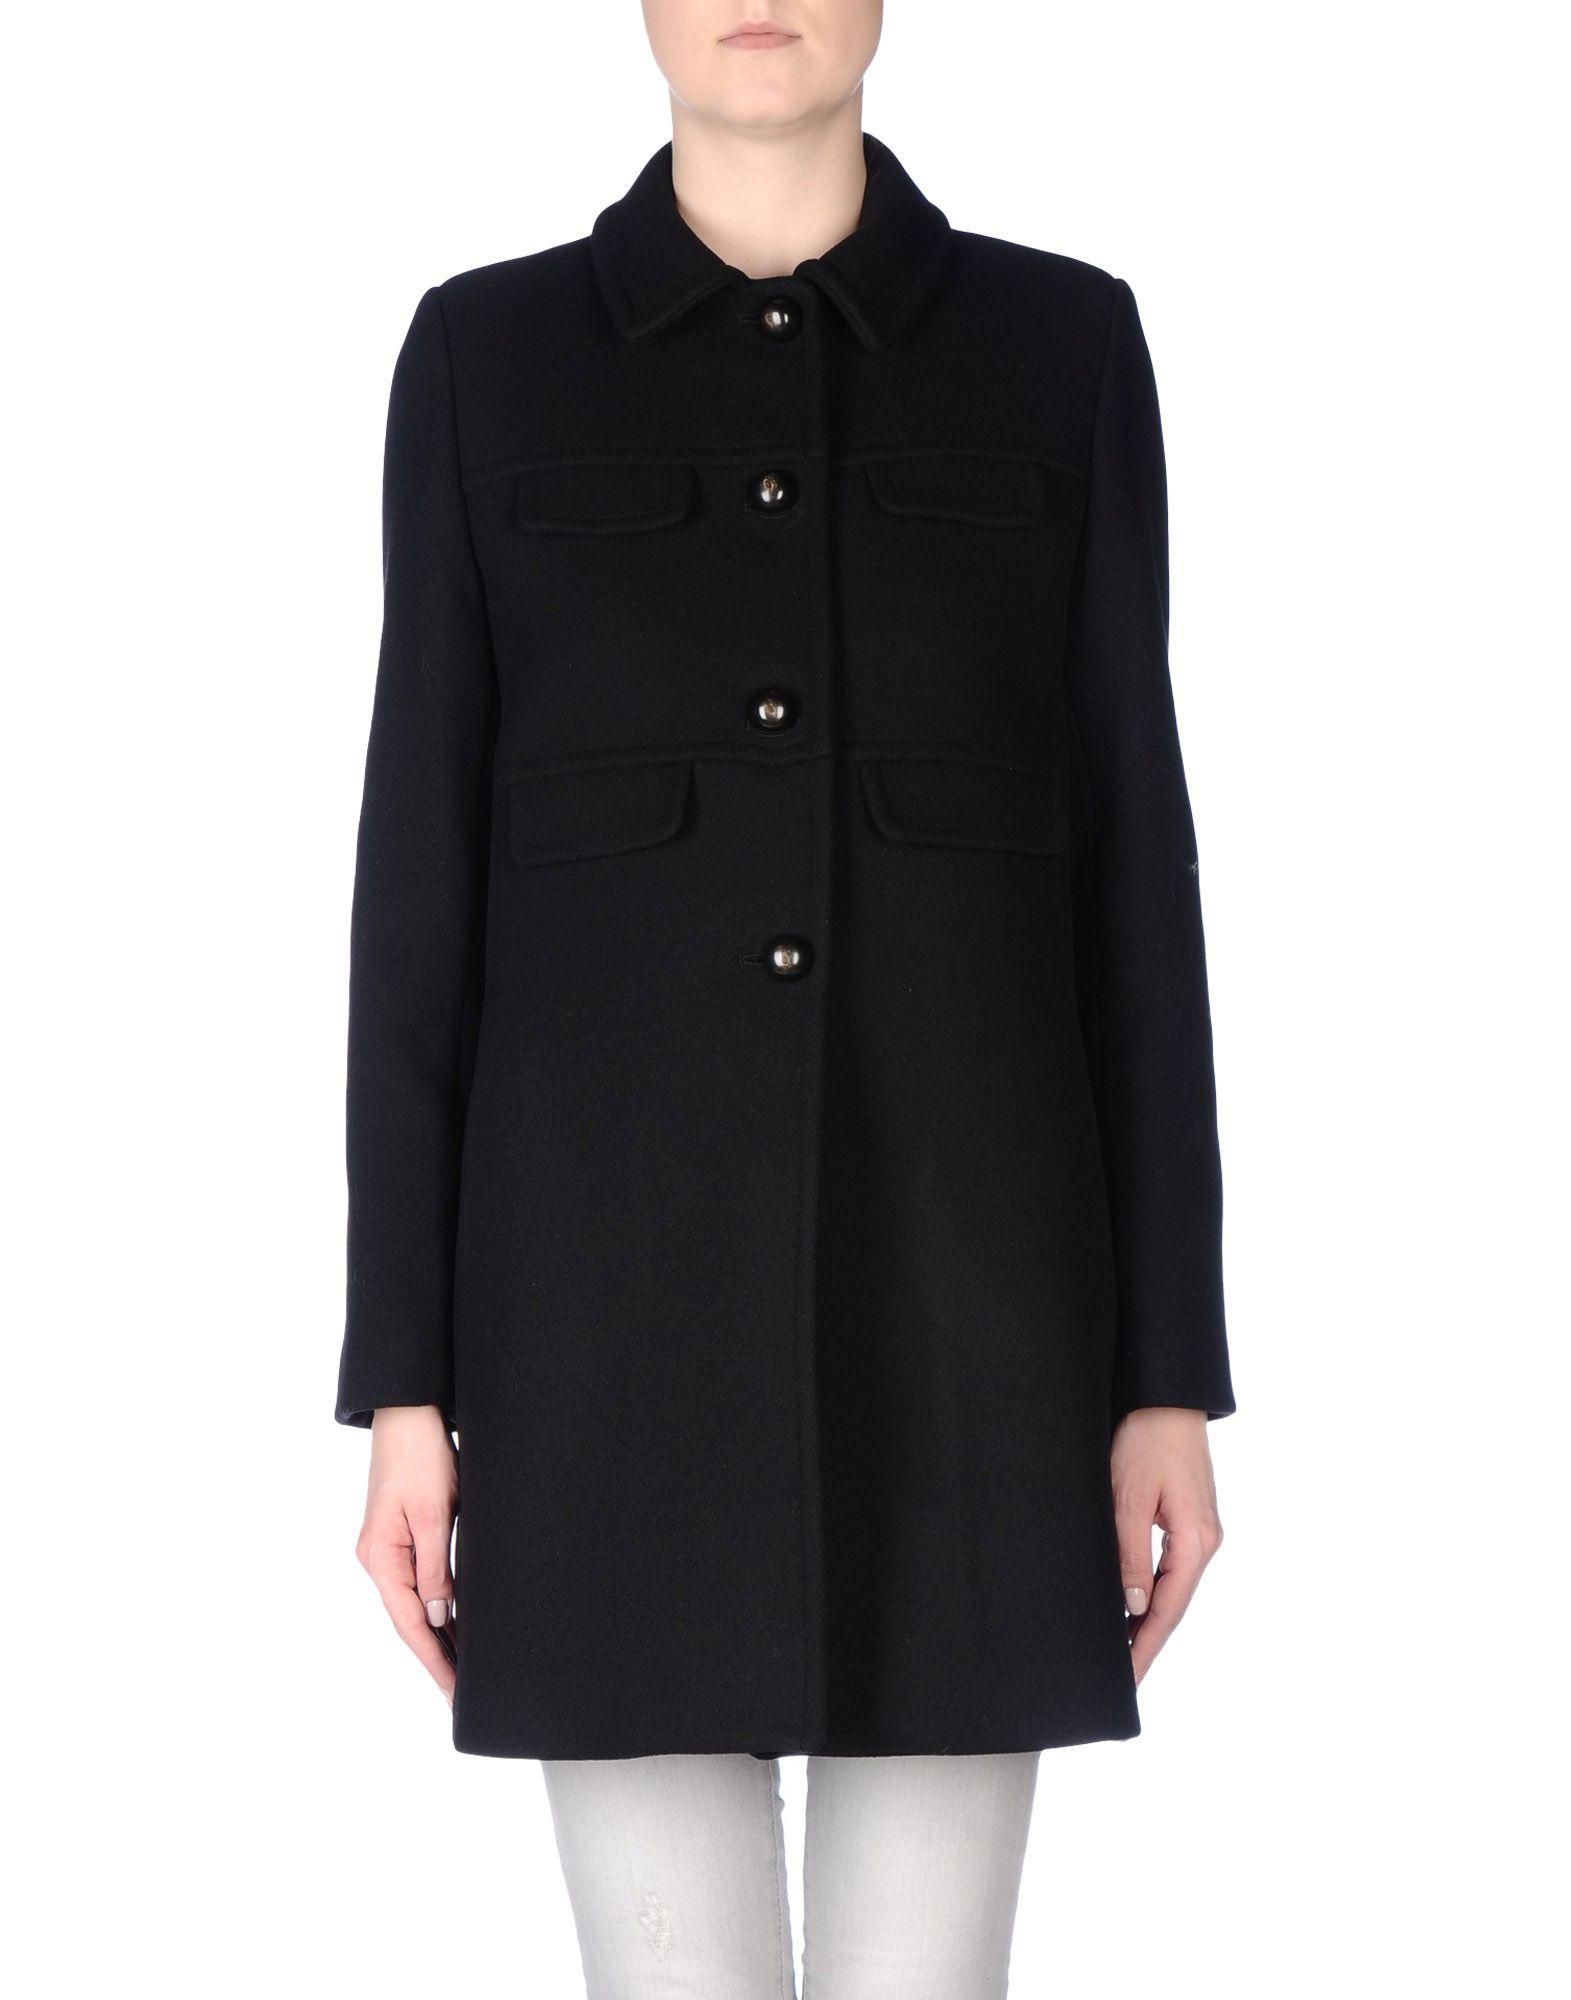 lyst paul joe coat in black. Black Bedroom Furniture Sets. Home Design Ideas